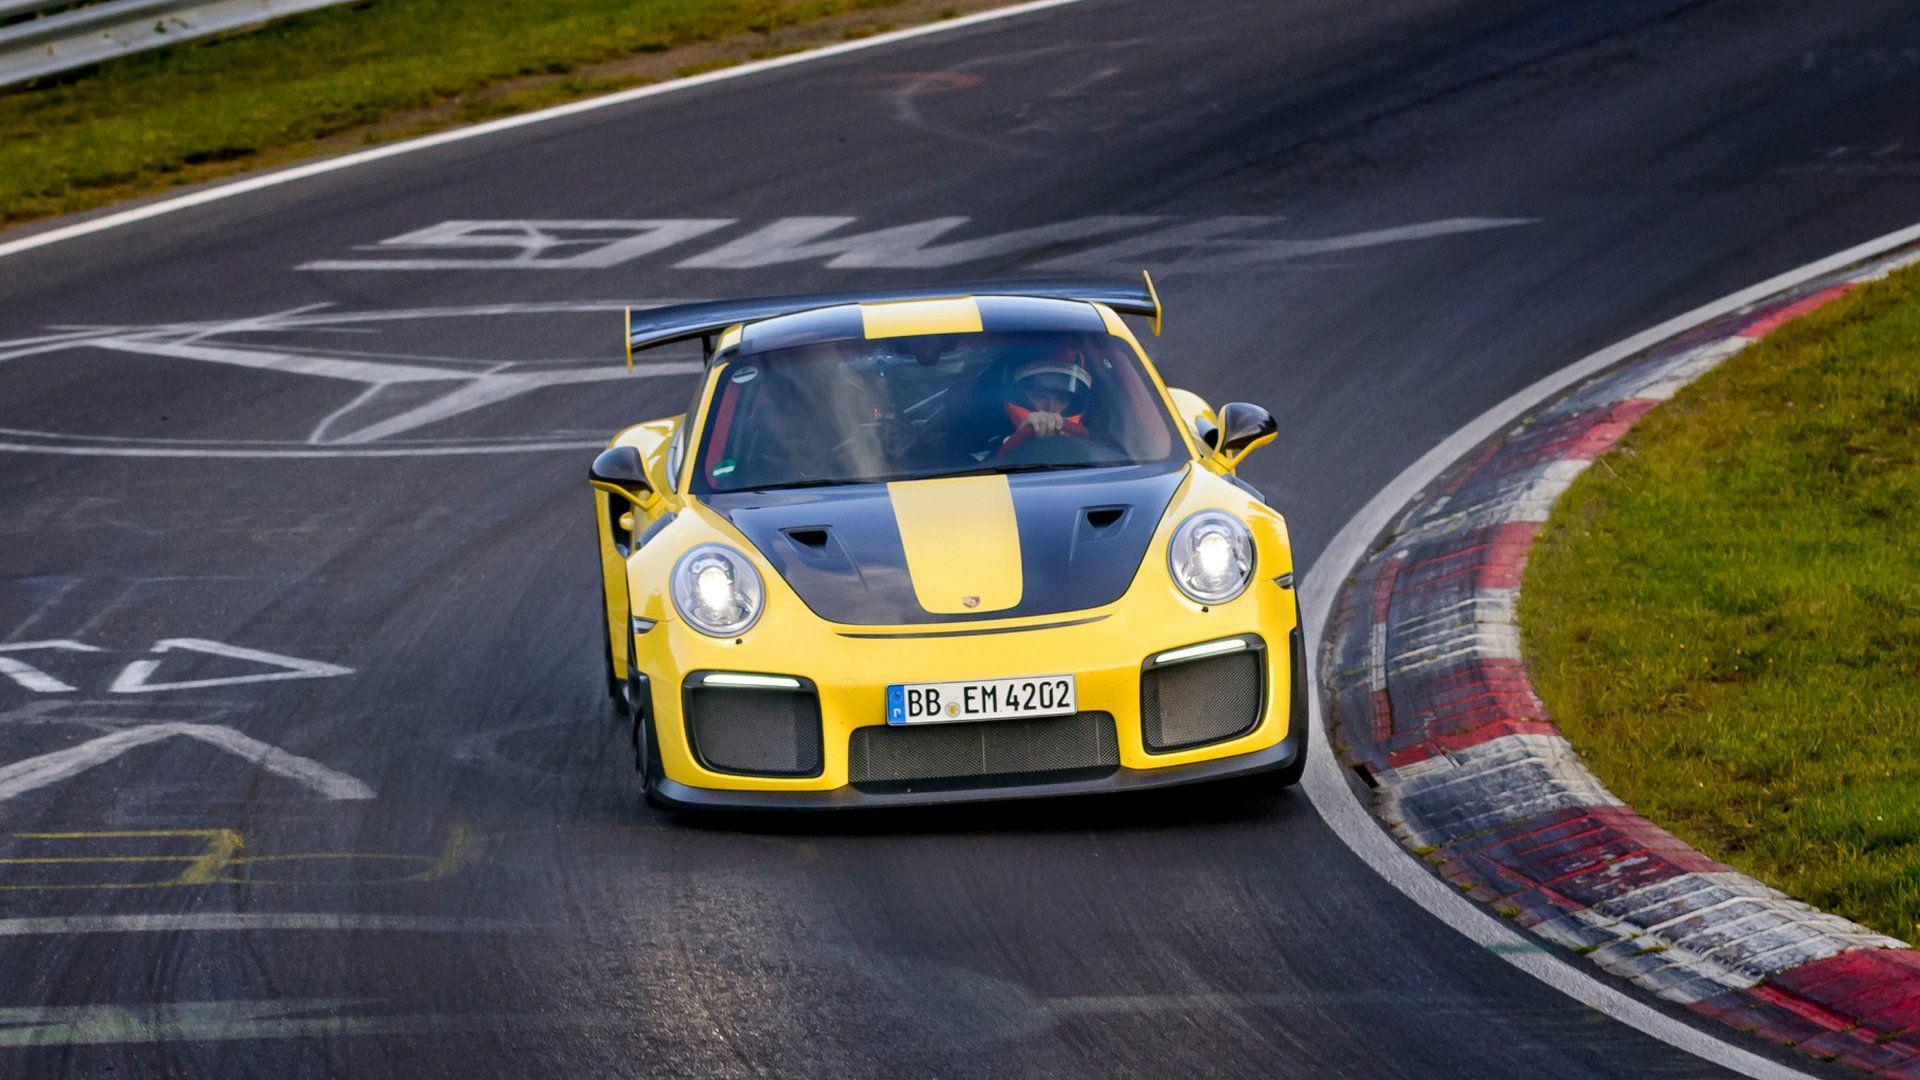 porsche-911-gt2-rs-nurburgring-record Cozy Porsche 911 Gt2 Rs Nürburgring Cars Trend